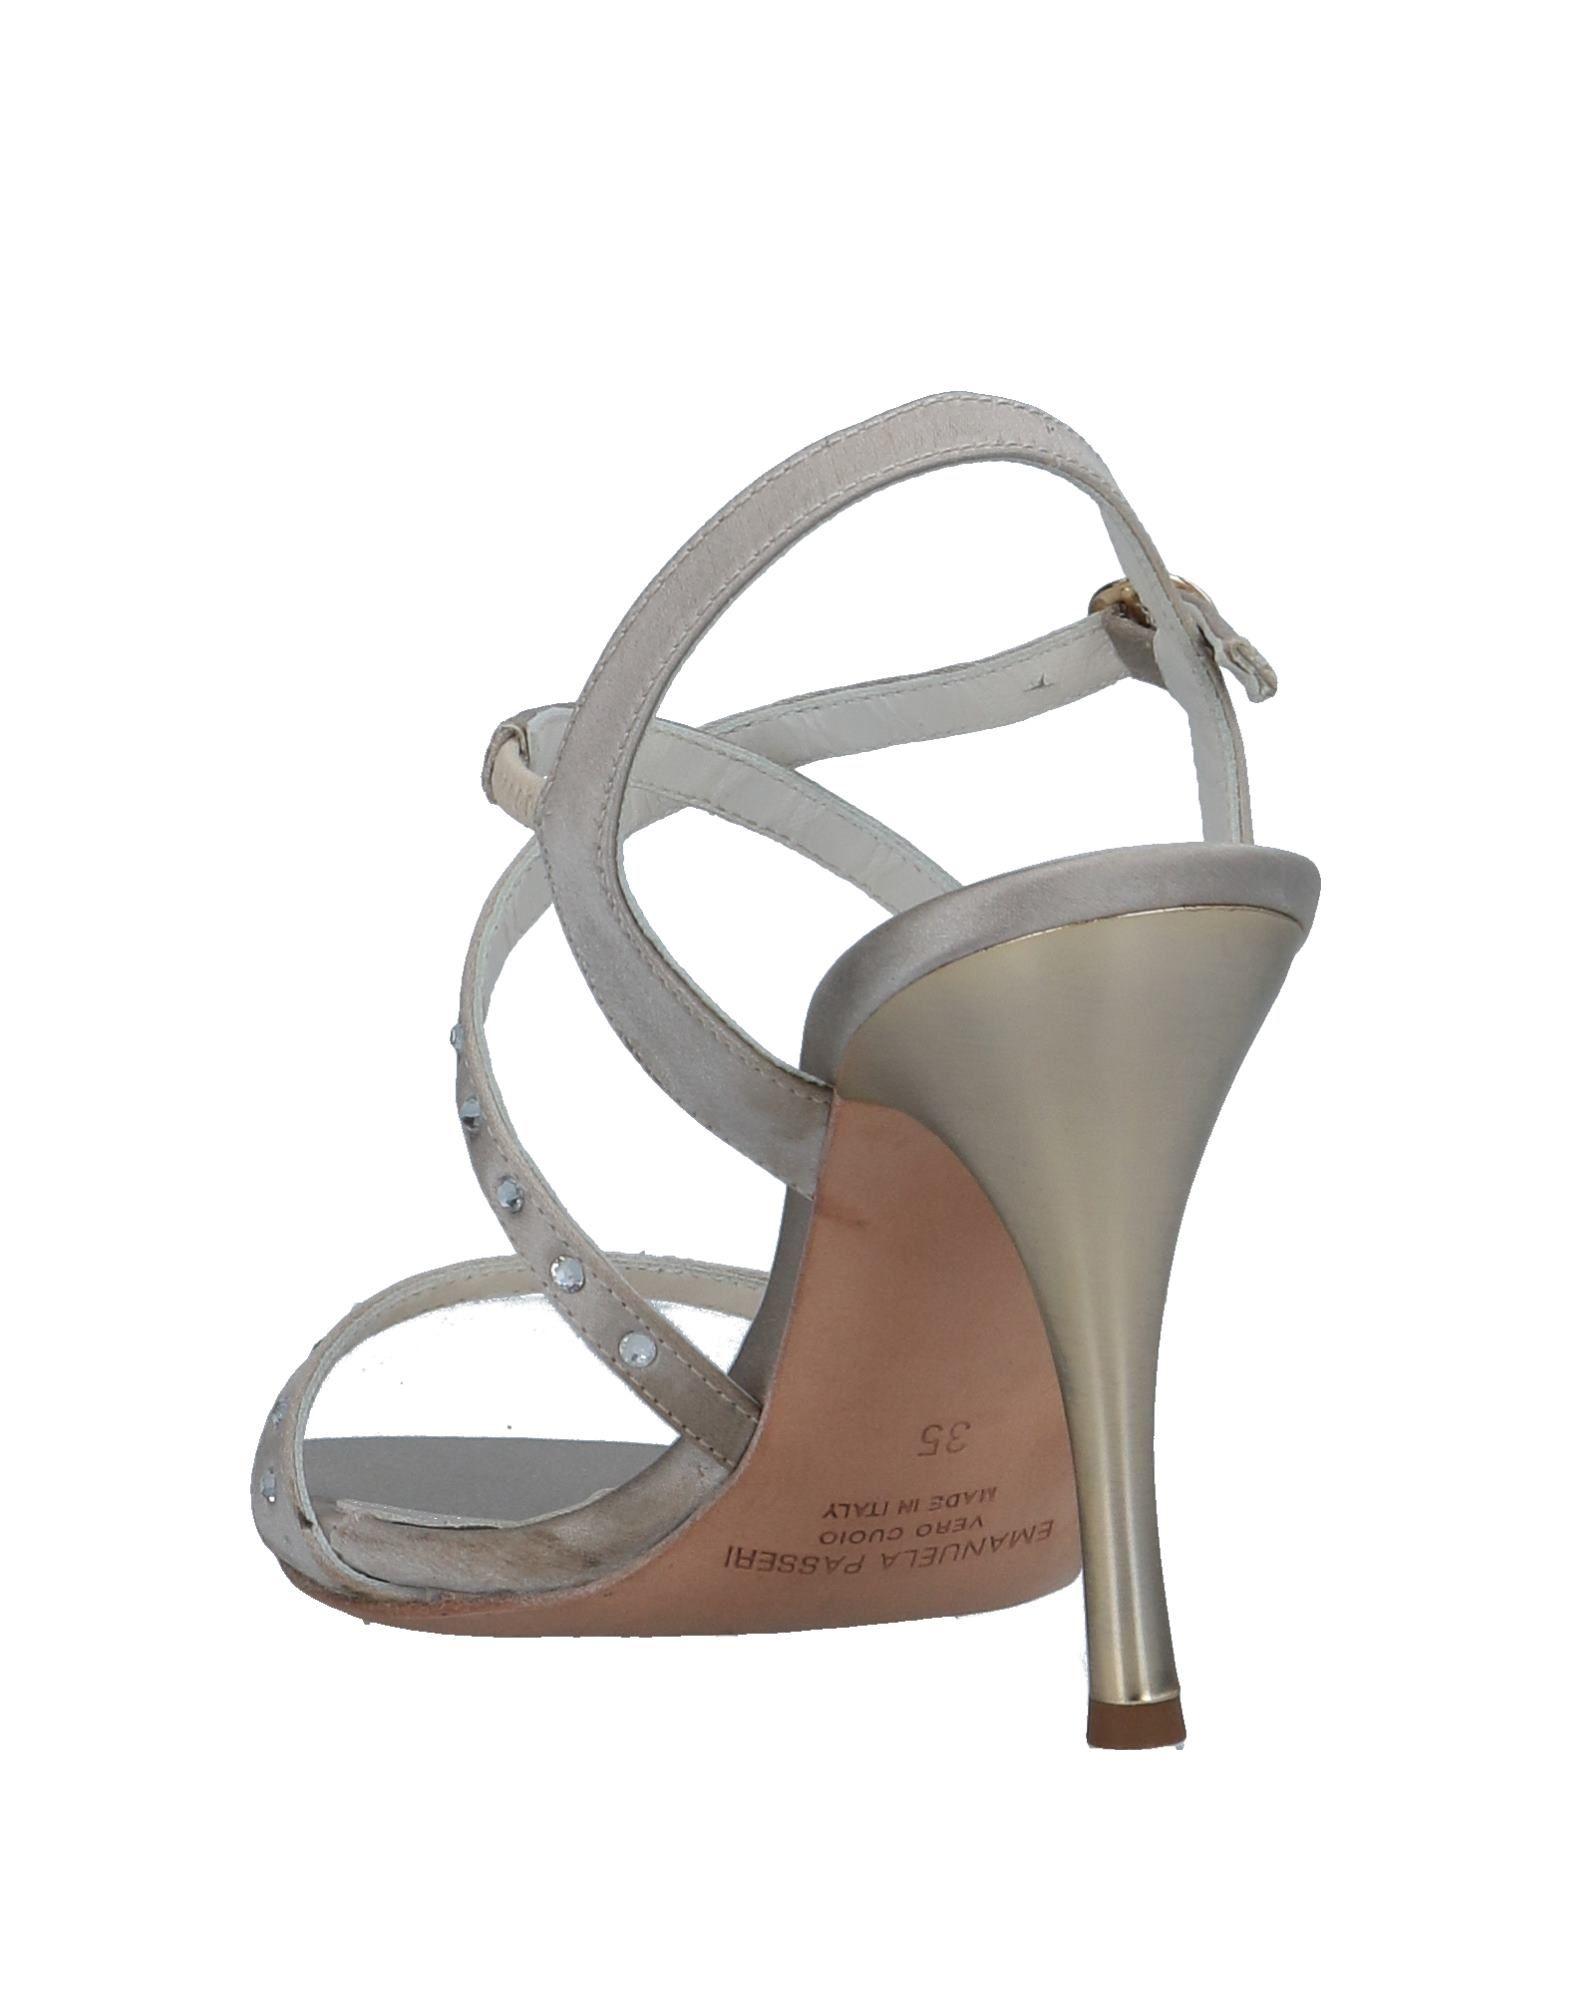 Emanuela 11525005HK Passeri Sandalen Damen  11525005HK Emanuela Gute Qualität beliebte Schuhe 17a0de